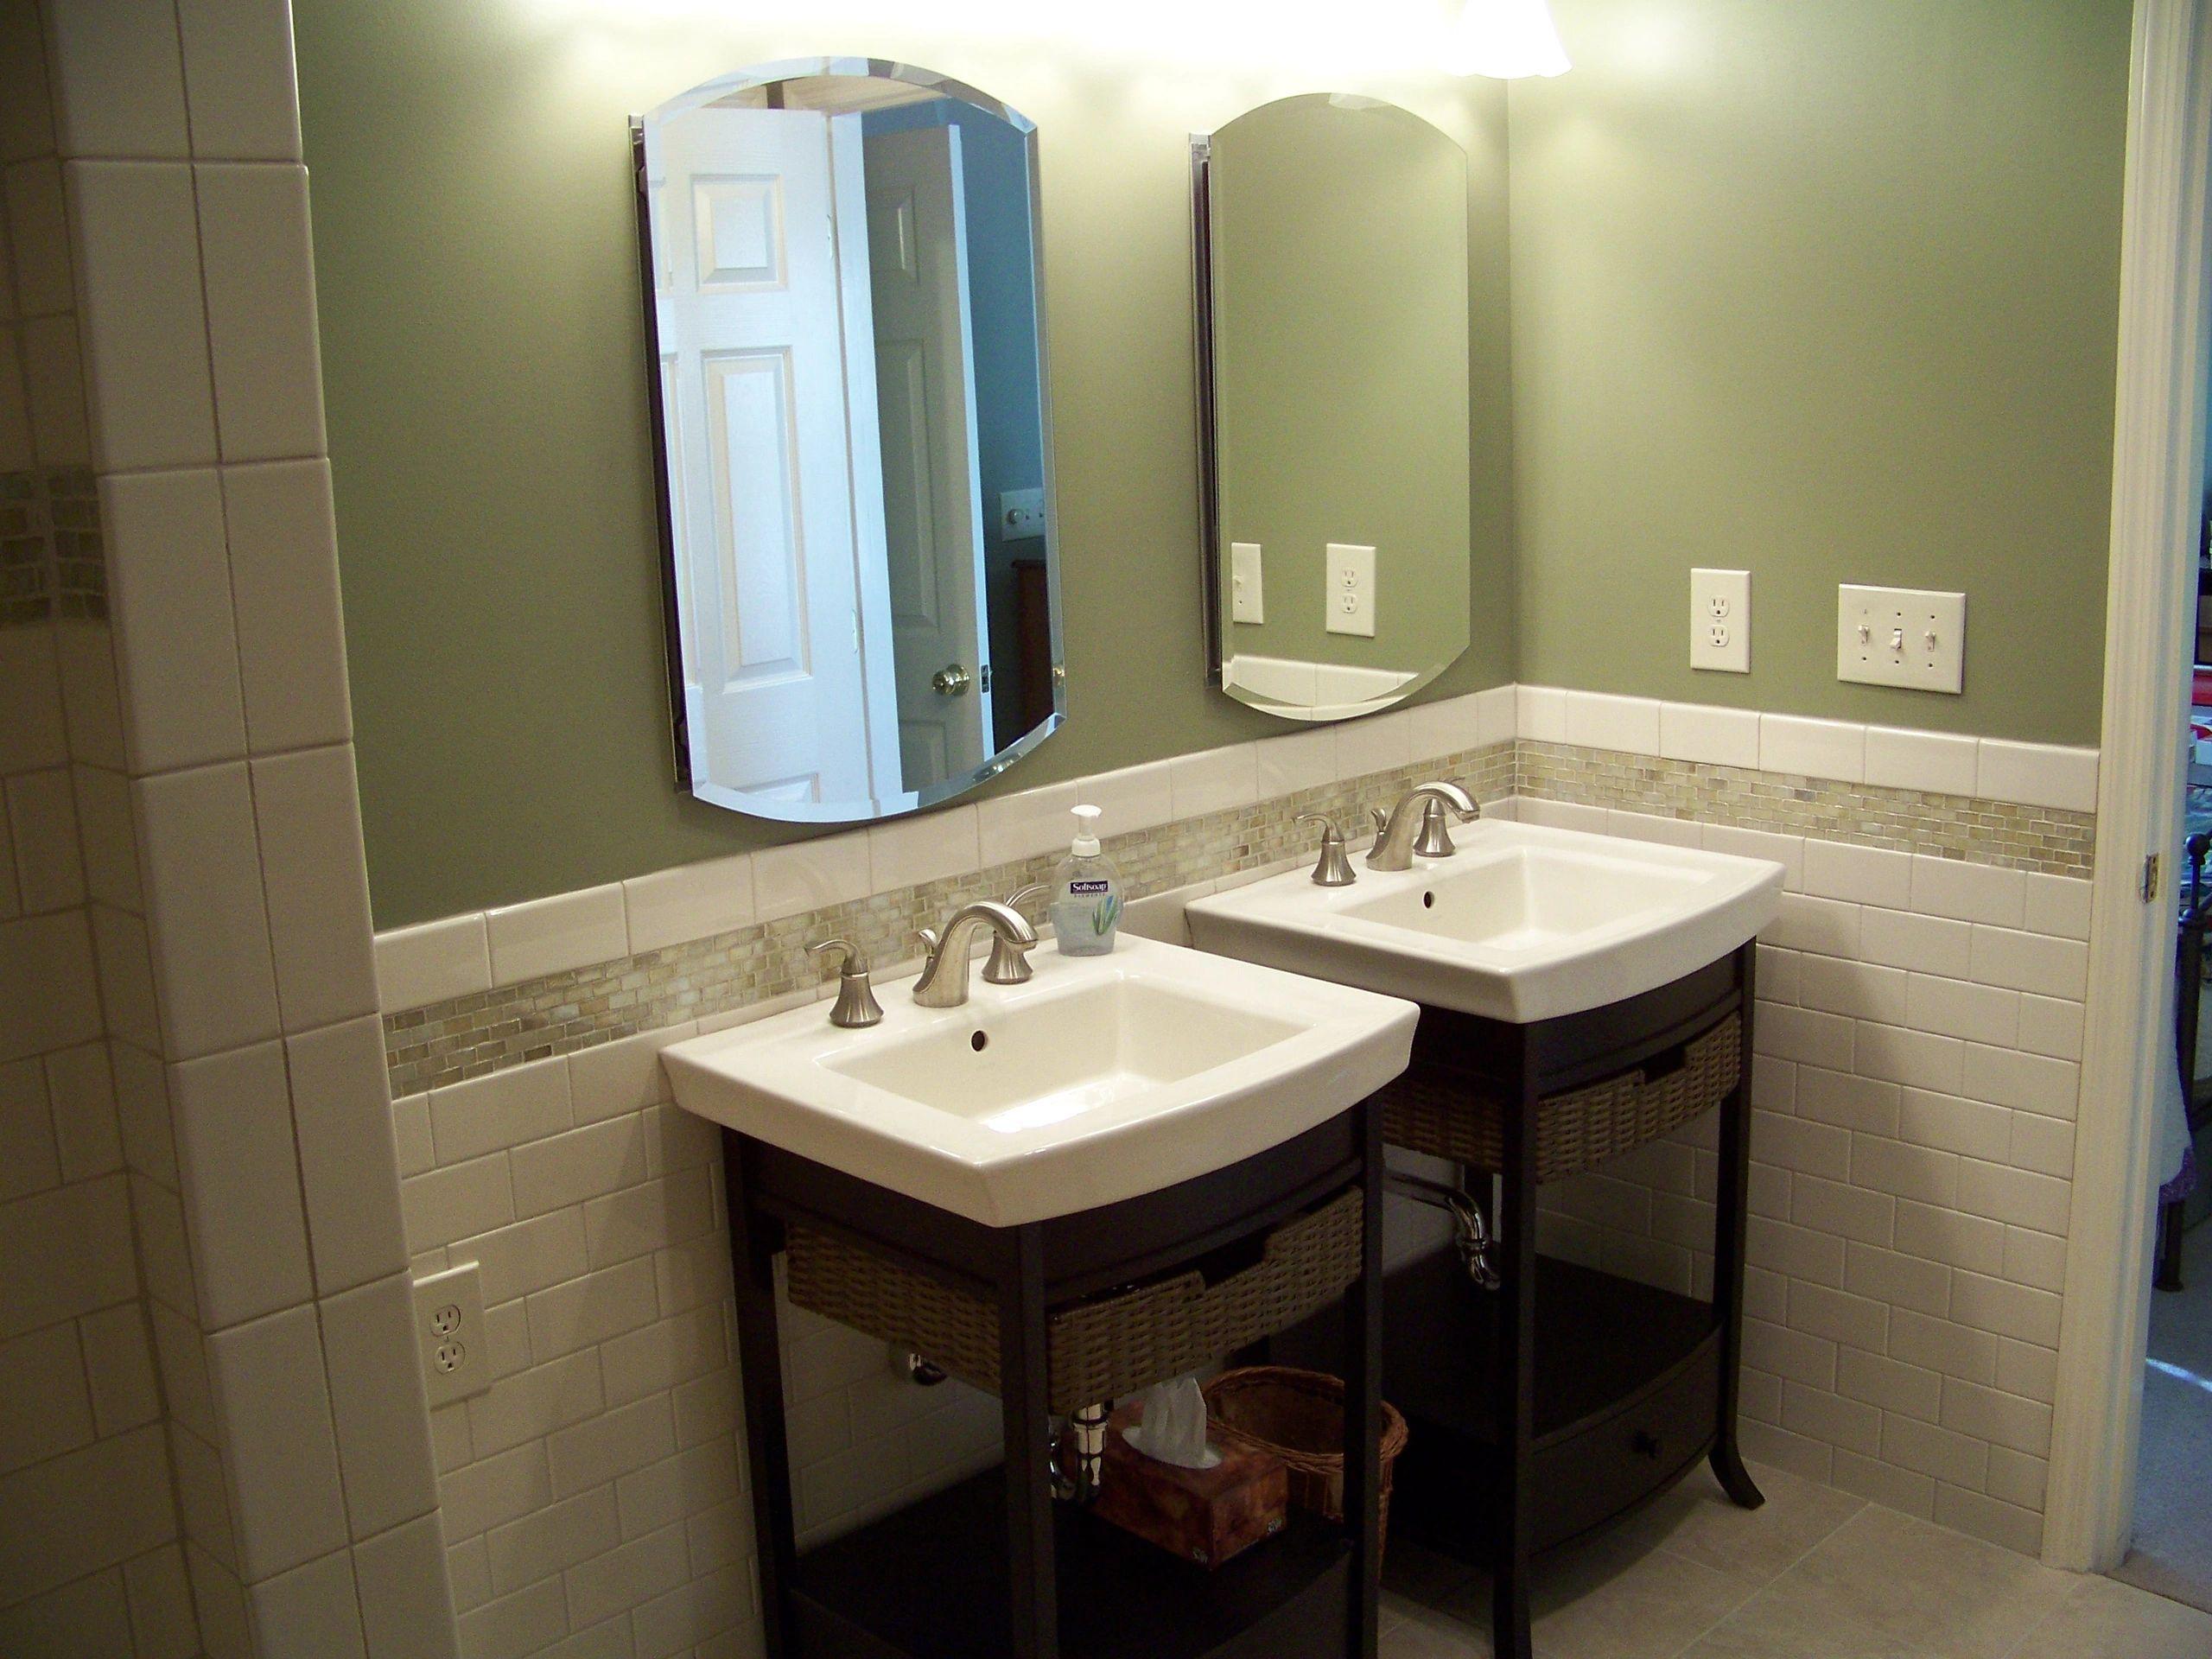 Bathroom Remodel Kitchen Upgrades Gibsonrenovationanddesign - Bathroom remodeling lexington ky